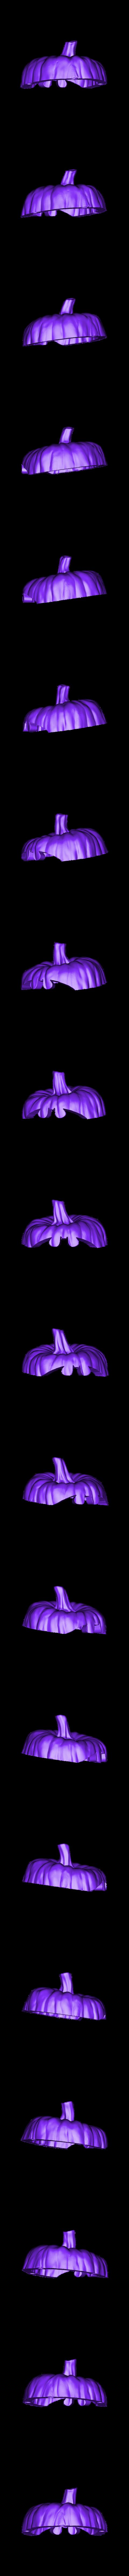 tophalf.stl Download free STL file Bat-o'-lantern • 3D print object, 3DJourney